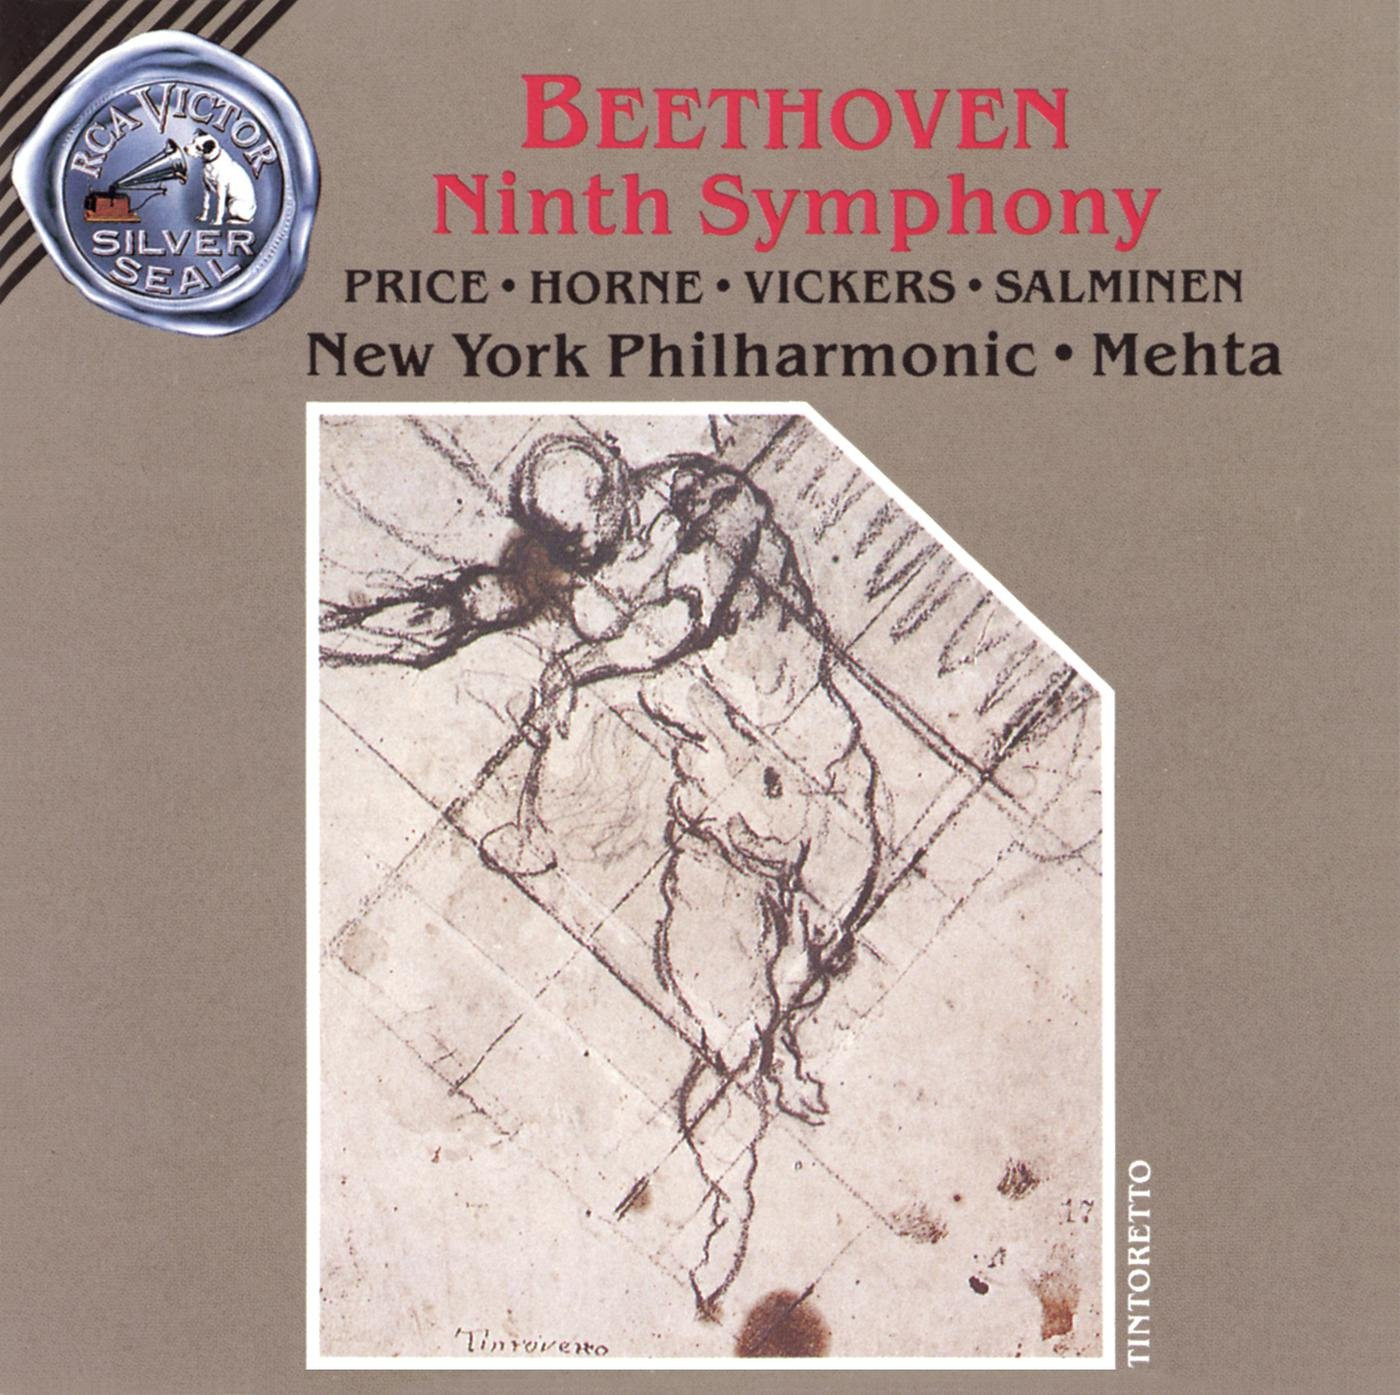 La Castafiore Beethoven Symphony No 9 Price Horne Vickers Salminen Mehta Mp3